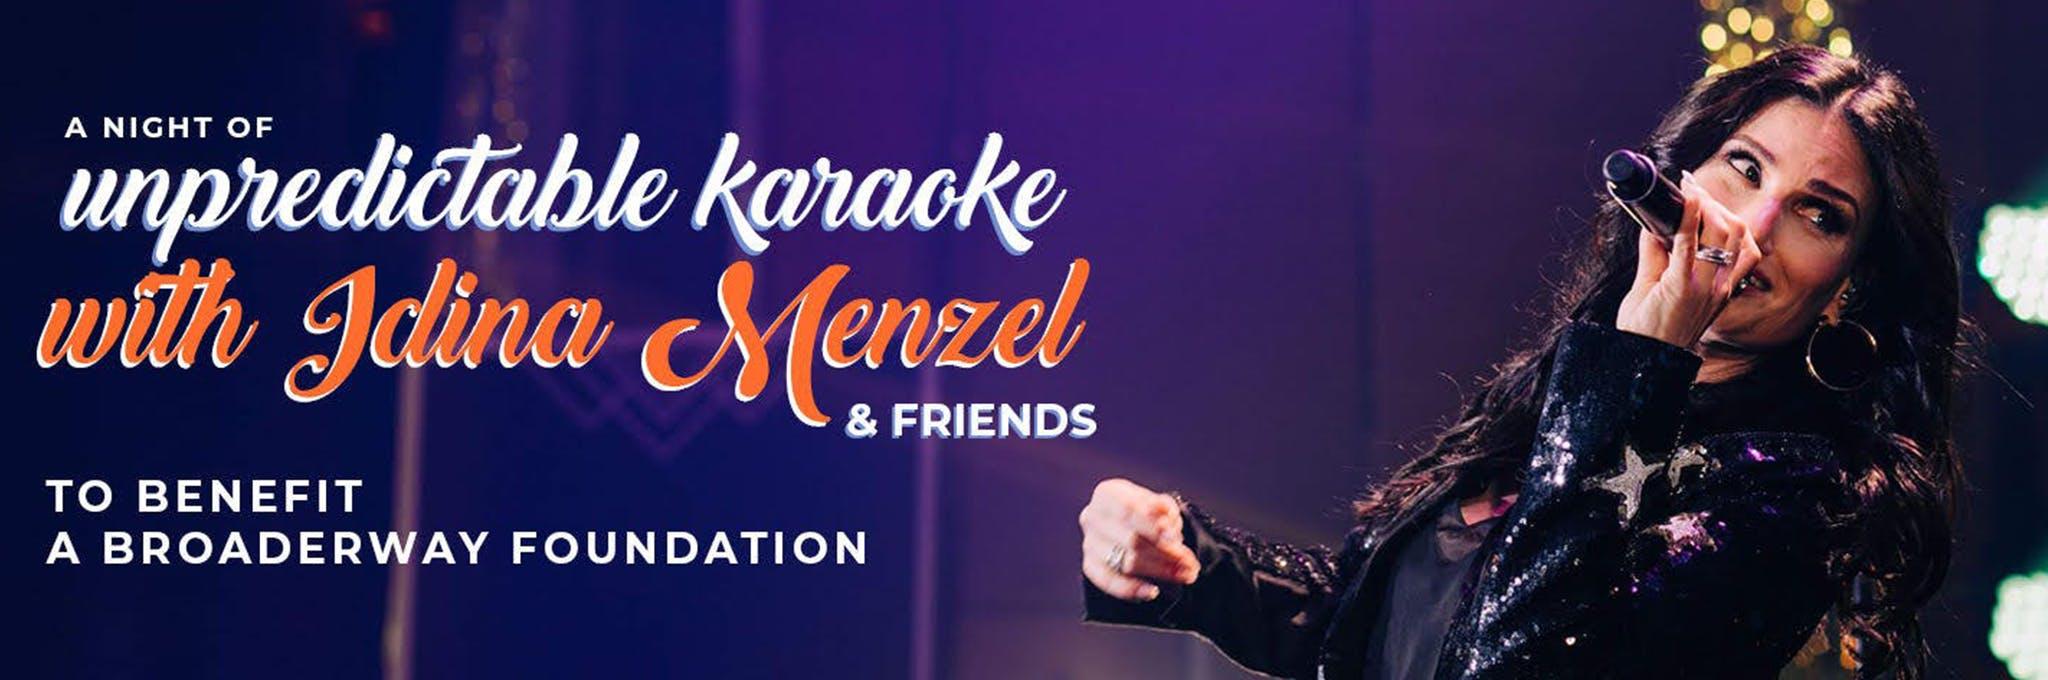 A Spectacular Night of Unpredictable Karaoke with Idina Menzel & Friends Logo